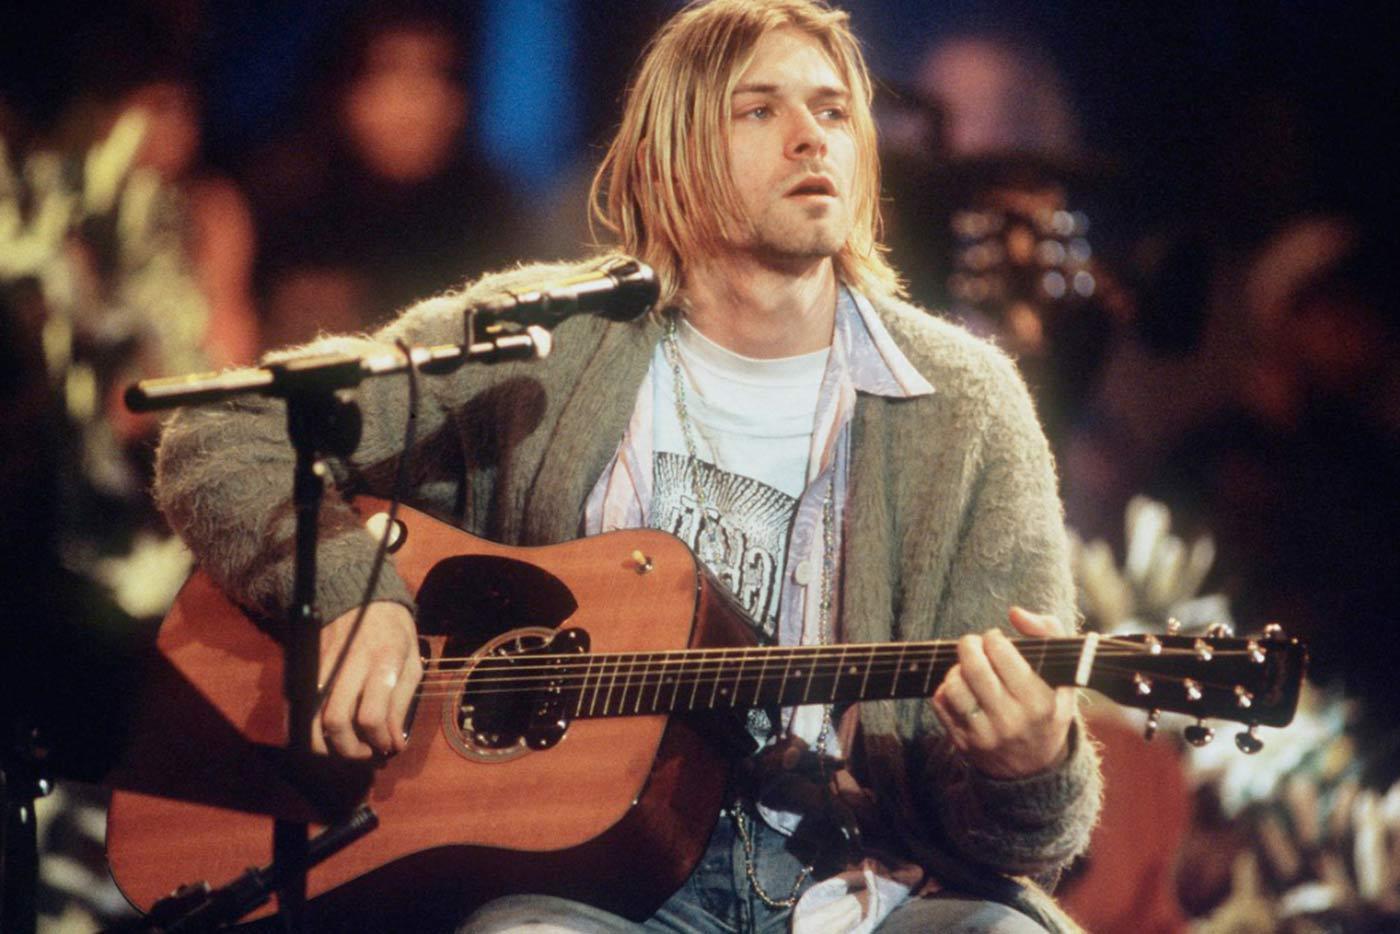 Se subasta la guitarra de Kurt Cobain por seis millones de dólares